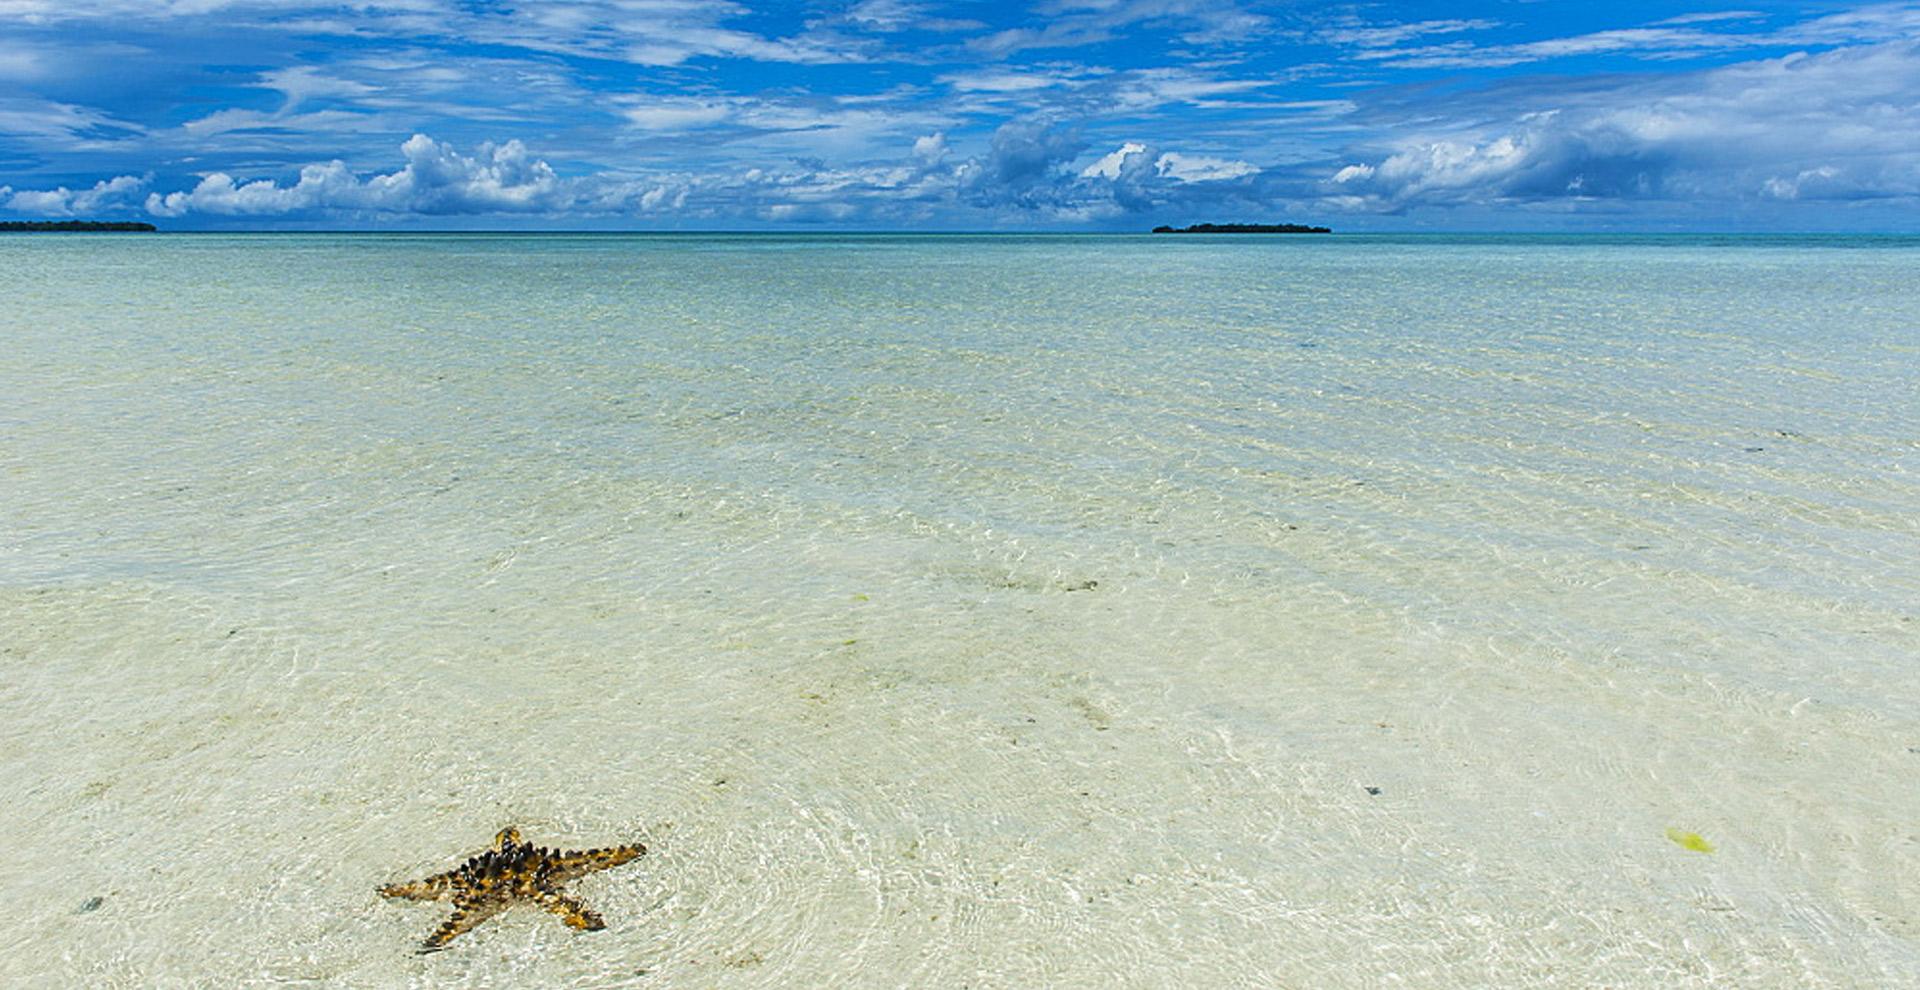 This Month We're Loving: Palau